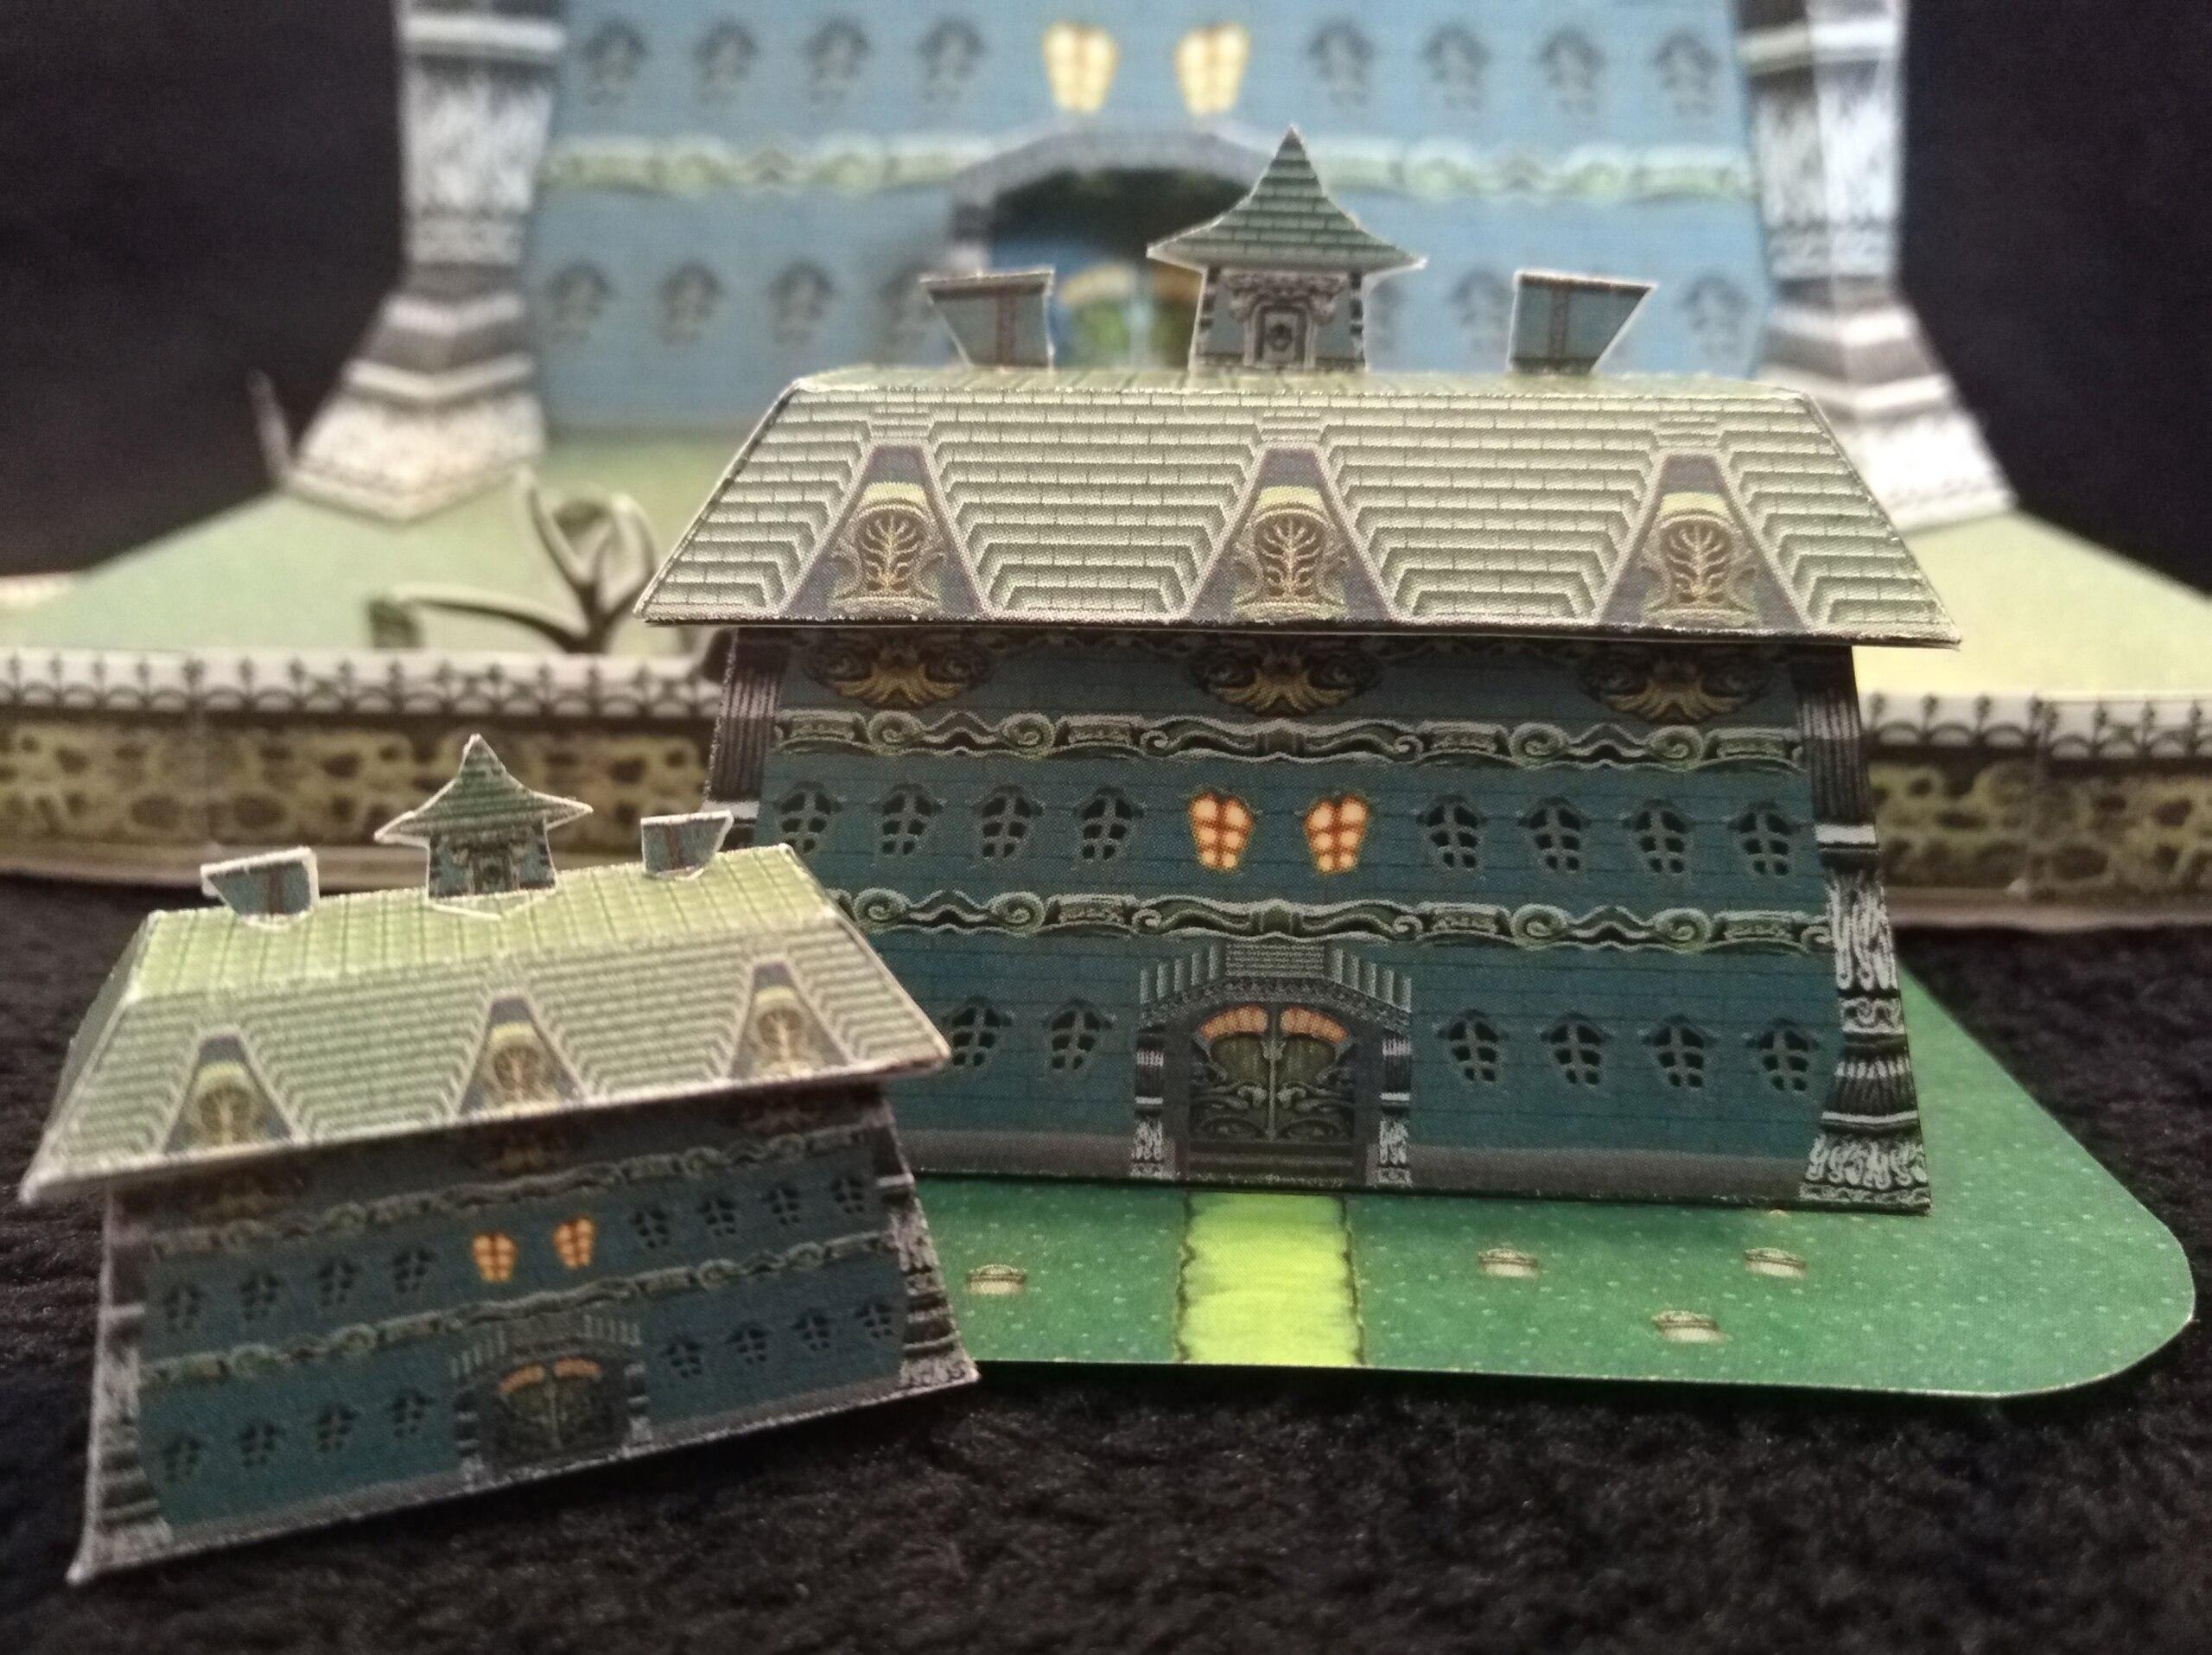 Luigi's Mansion - Die Gruselvilla aus dem Gamecube-Klassiker Img_2034